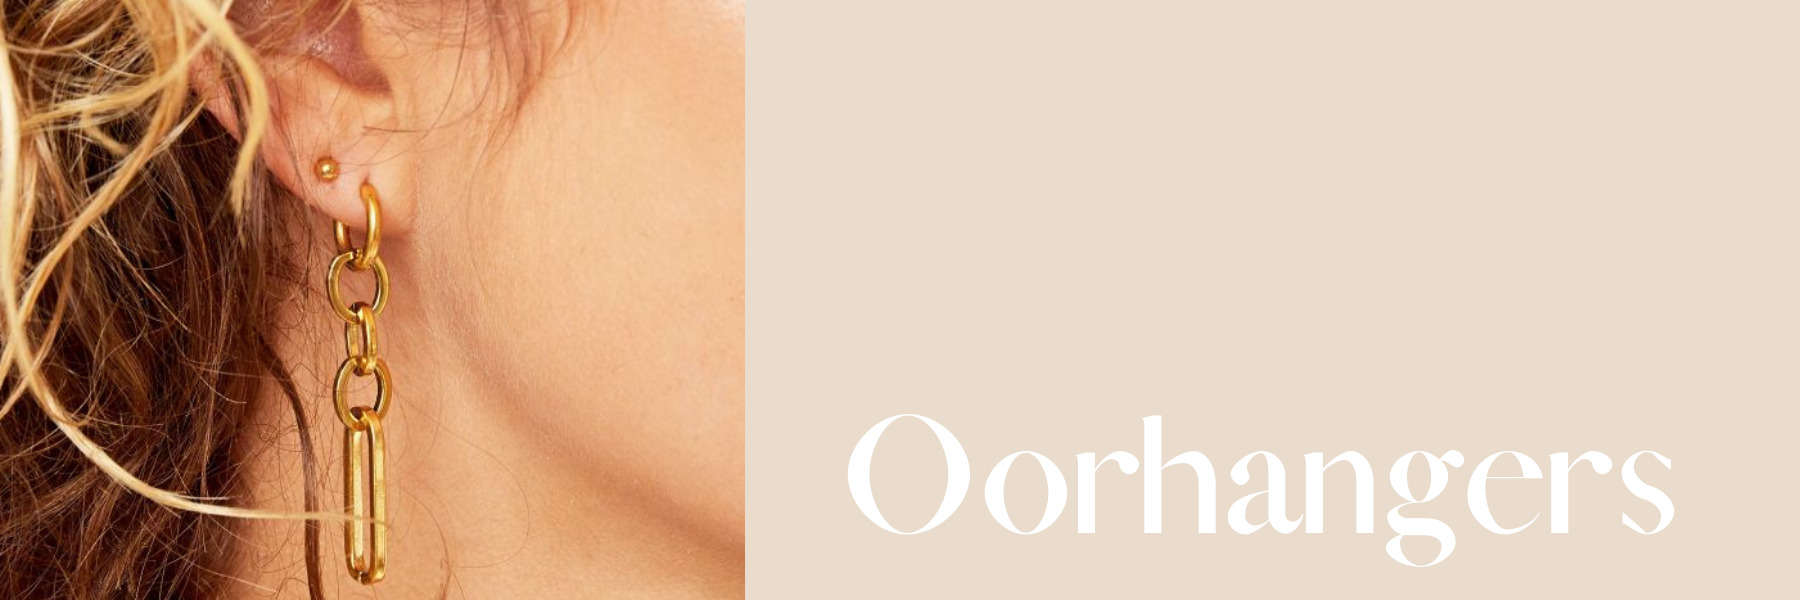 Oorhangers